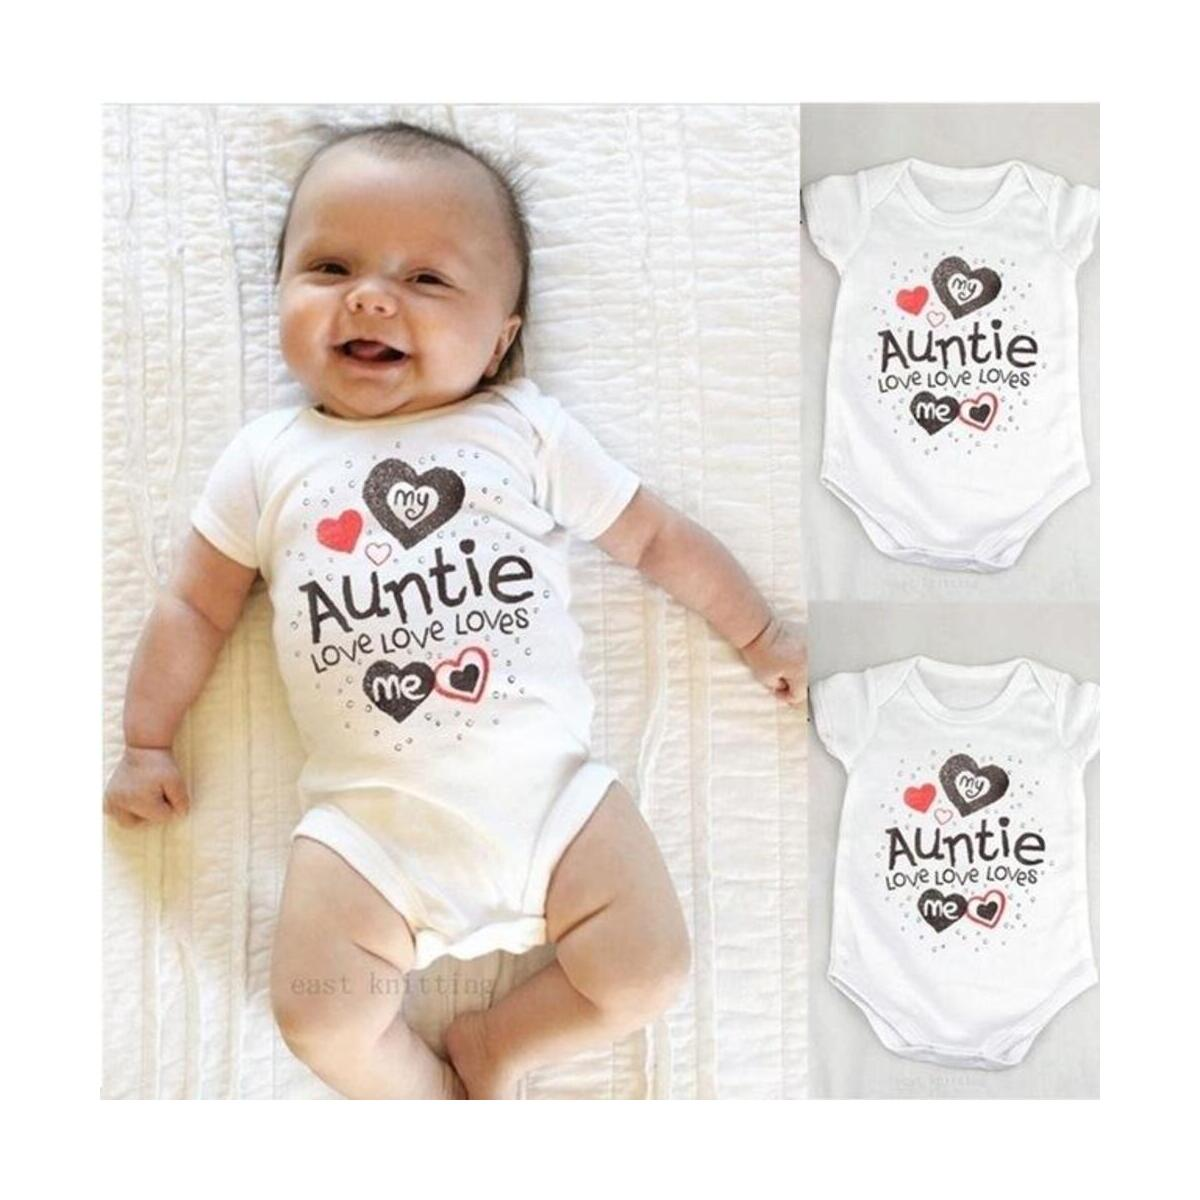 My Auntie Love Me Baby Boy Girls Romper Jumpsuit Bodysuit